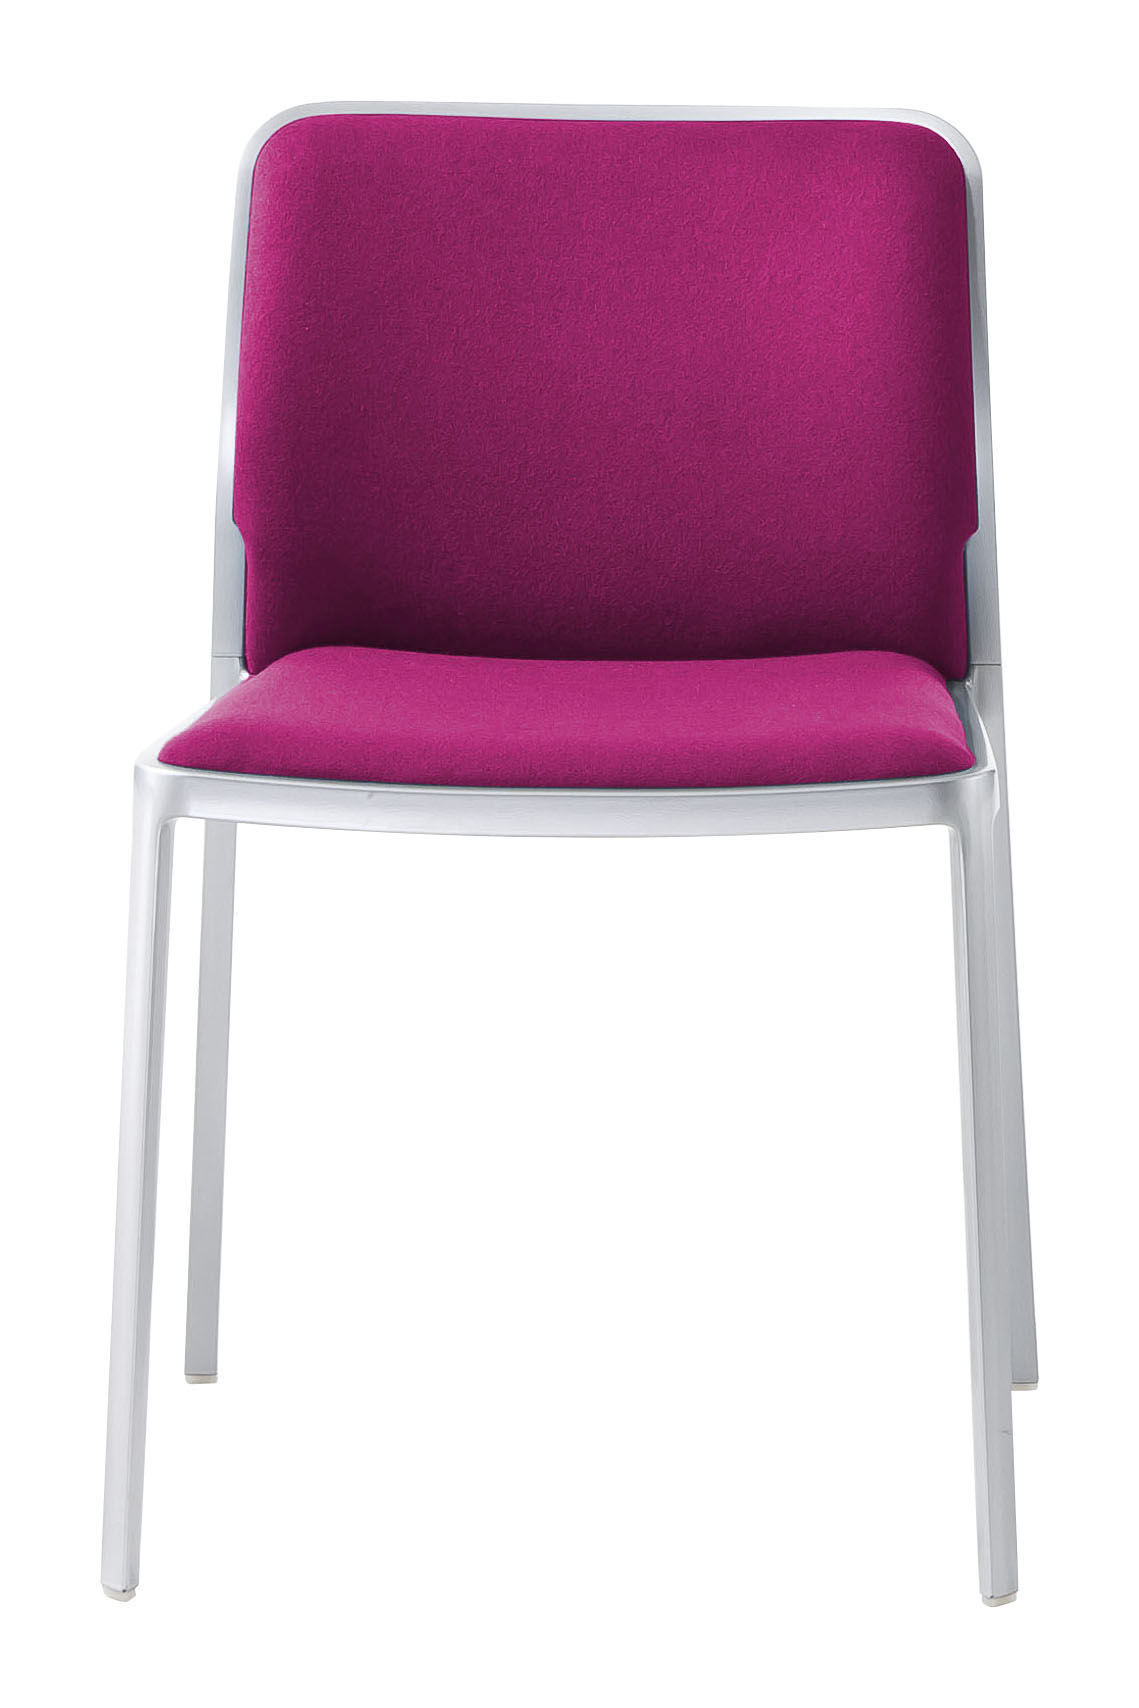 Möbel - Stühle  - Audrey Soft Gepolsterter Stuhl / Sitzfläche aus Stoff - Gestell Aluminium mattiert - Kartell - Gestell: Aluminium matt / Sitzfläche: Stoff fuchsia - Gewebe, klarlackbeschichtetes Aluminium